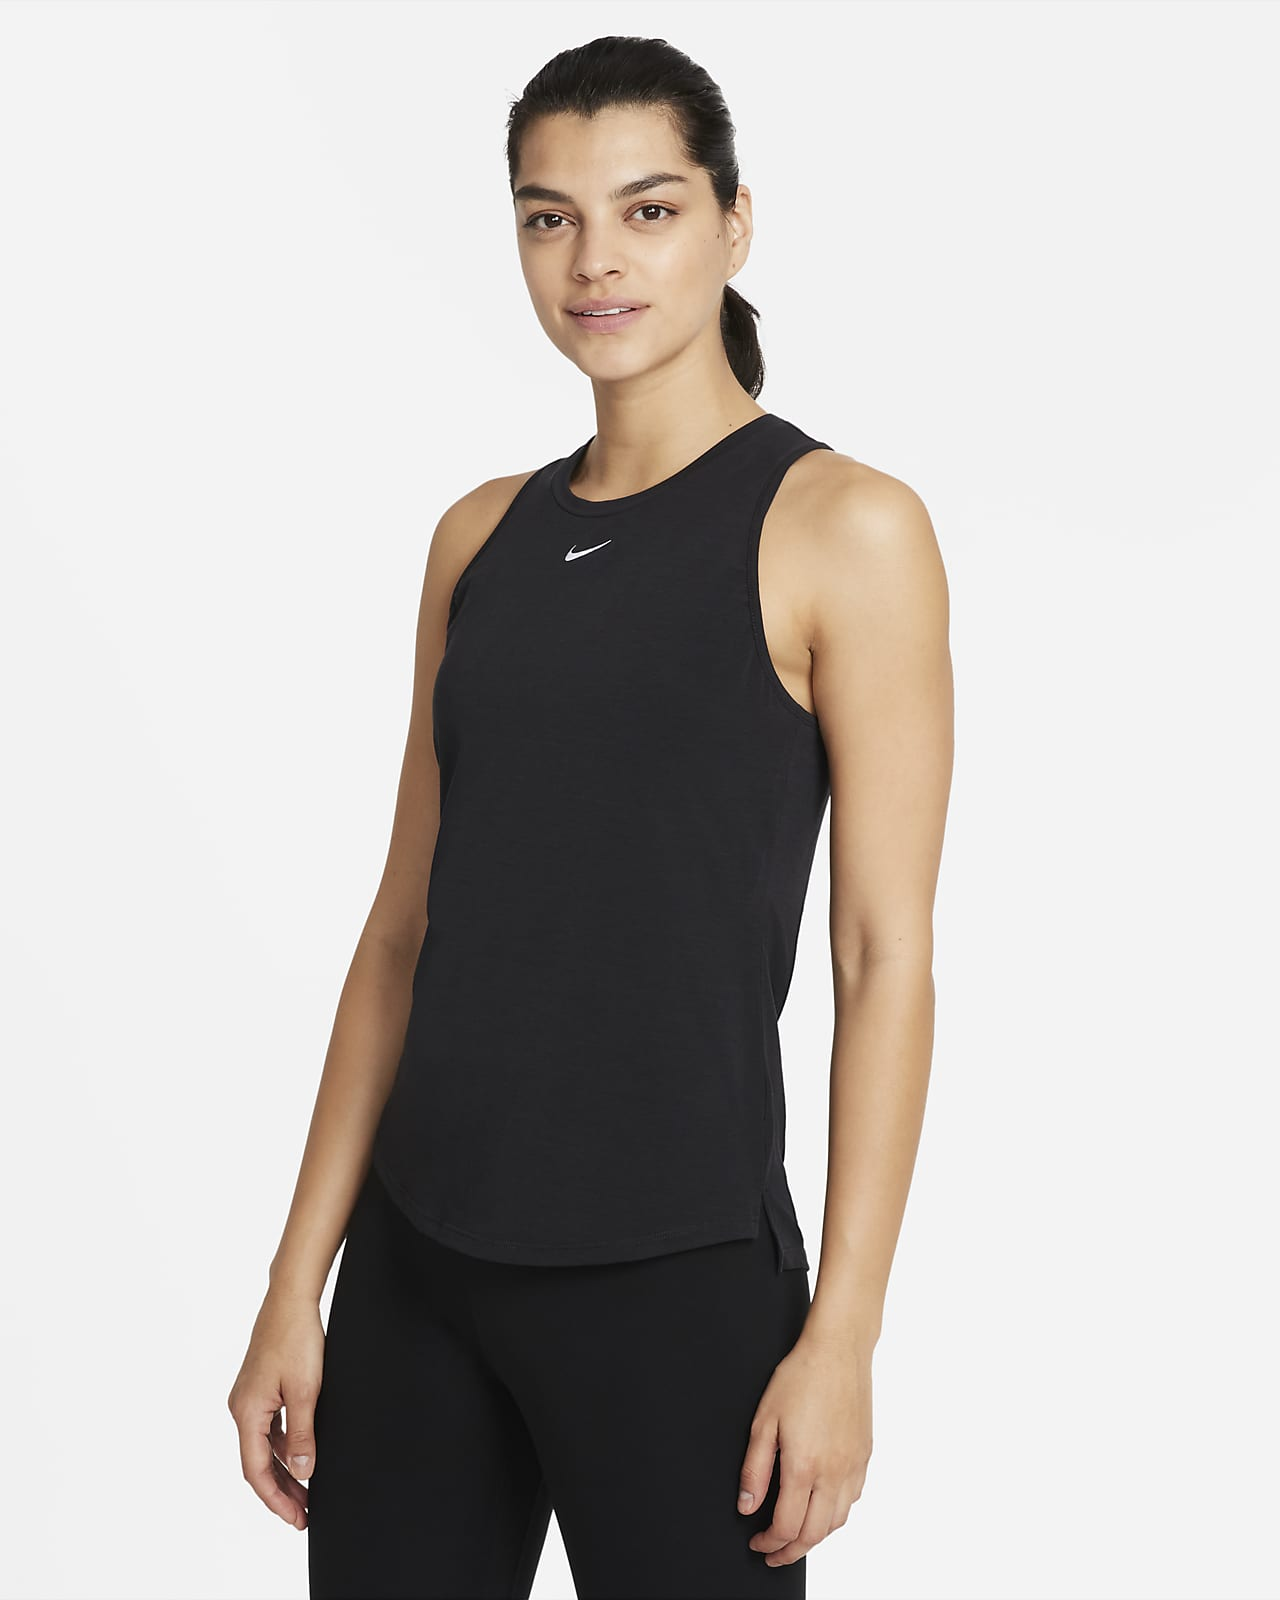 Camiseta de tirantes de ajuste estándar para mujer Nike Dri-FIT One Luxe